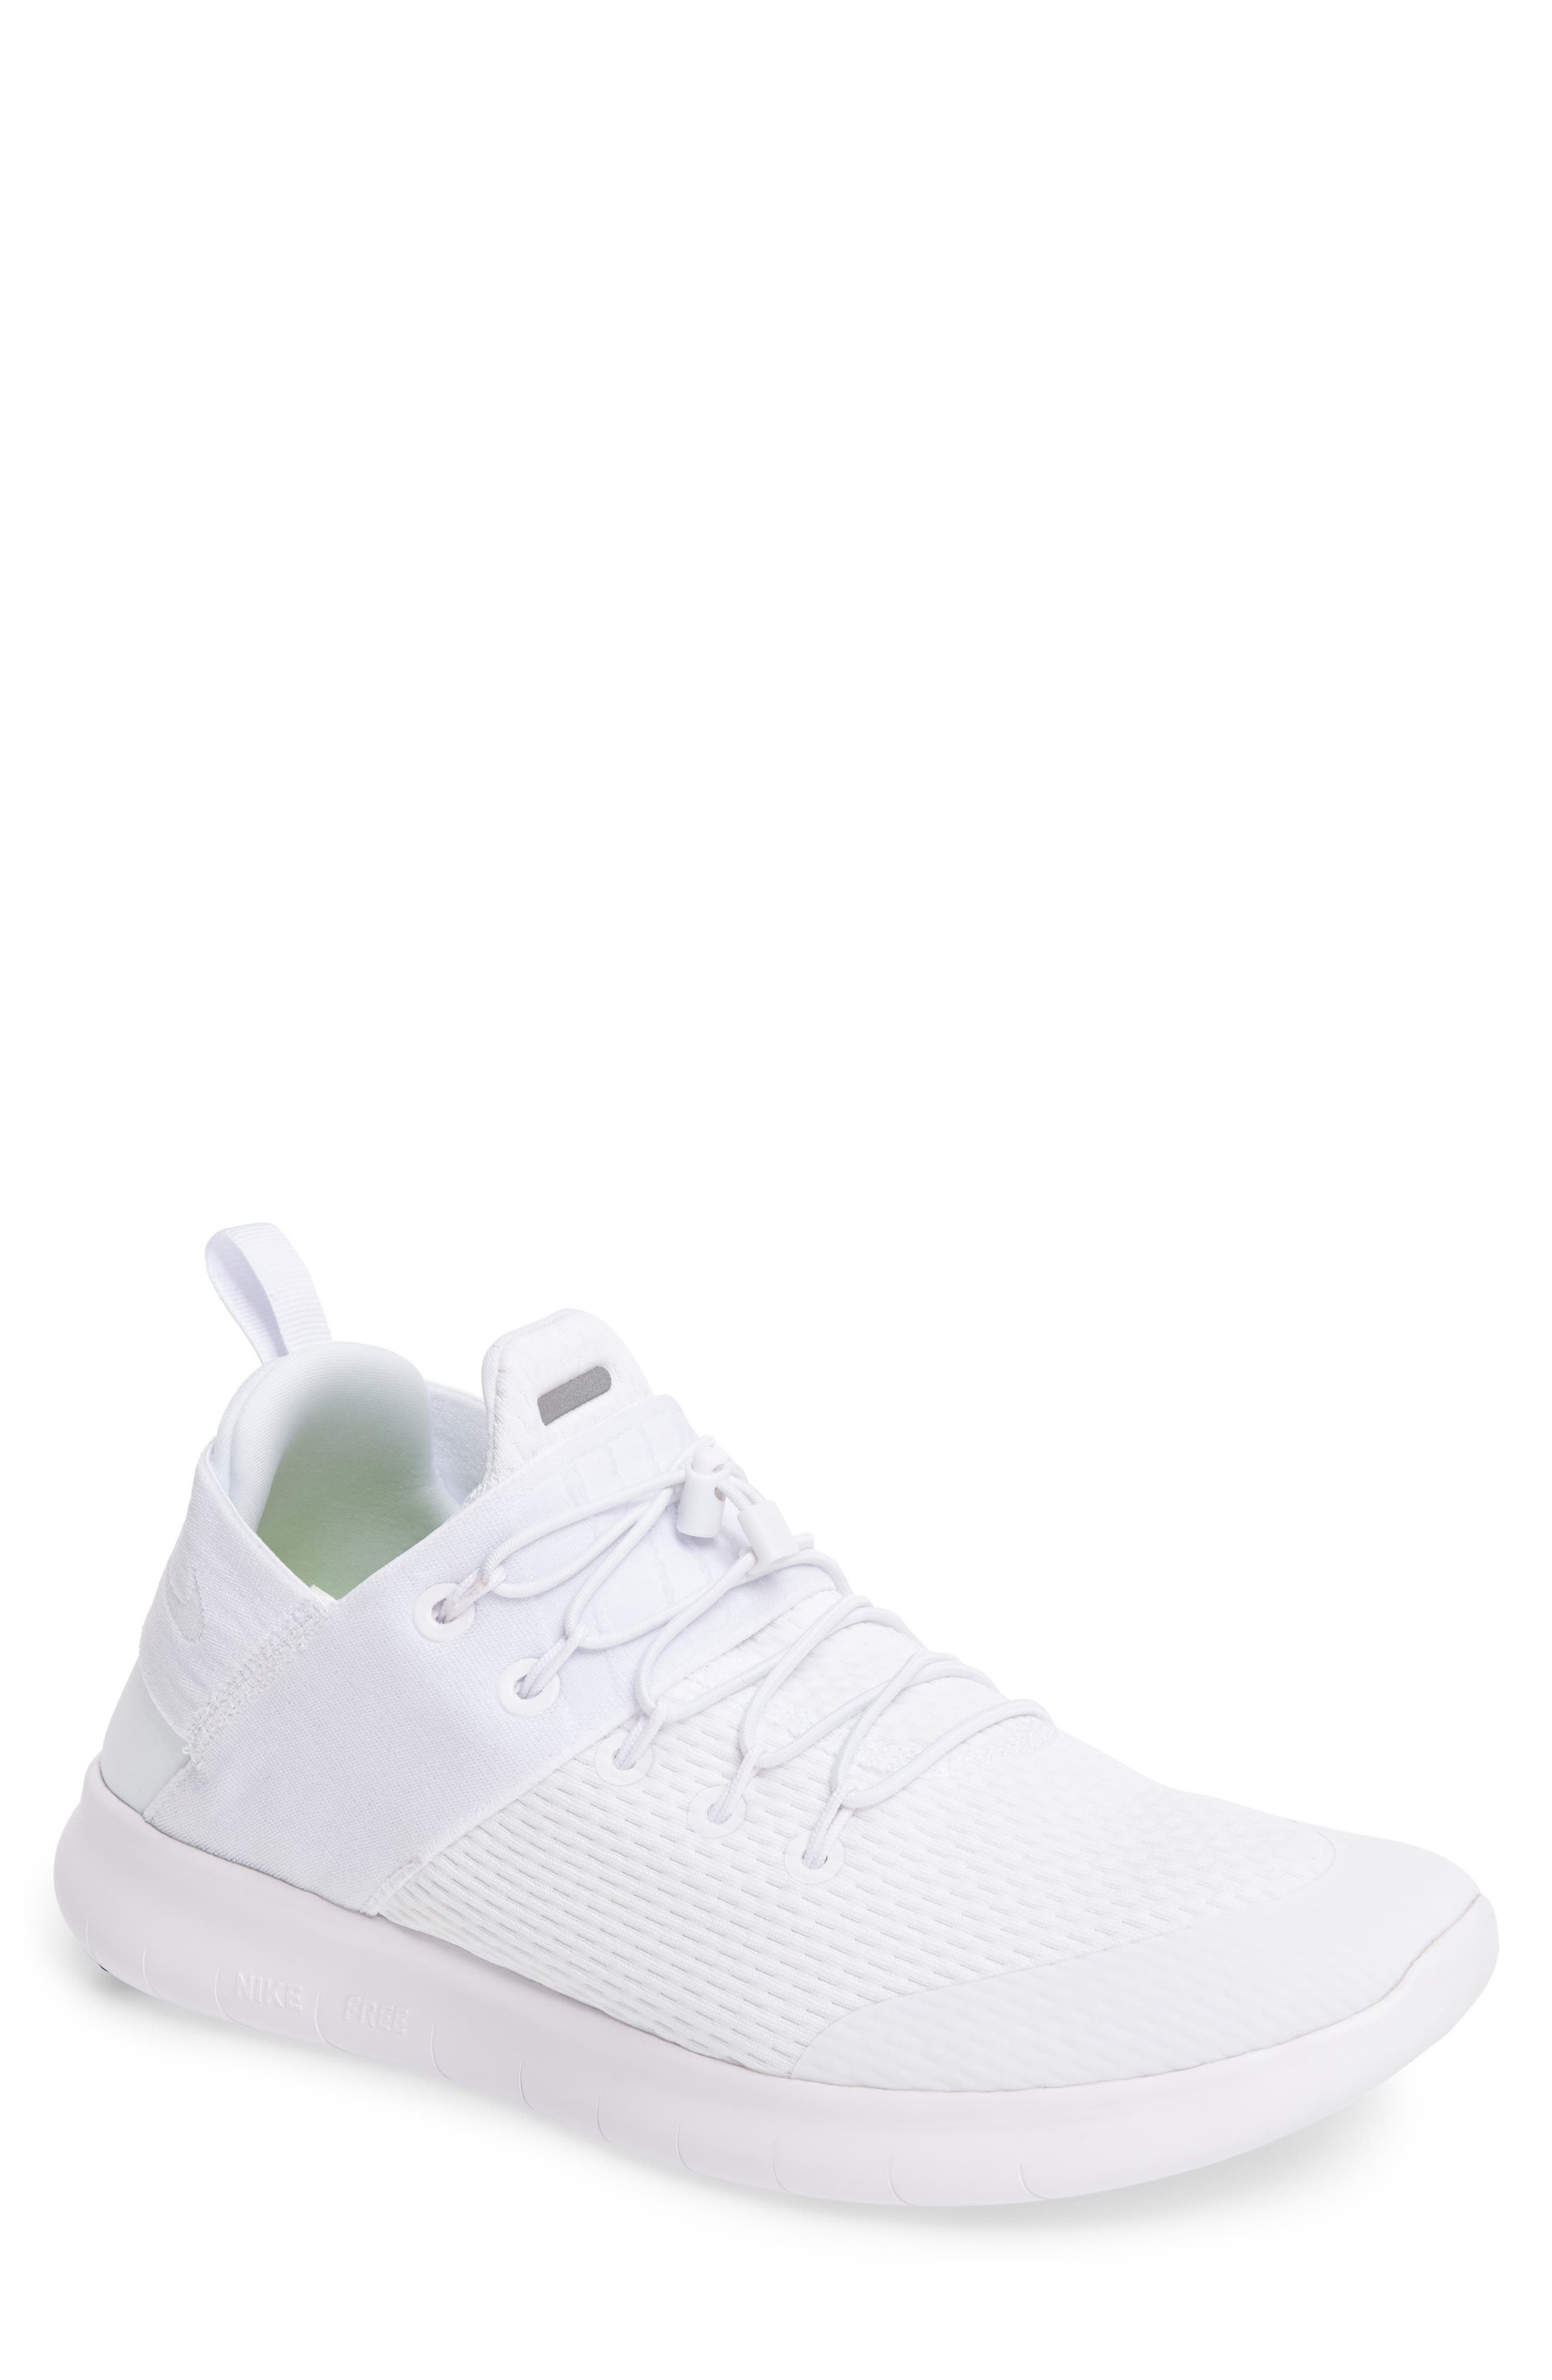 Free RN CMTR 2 Running Shoe,                         Main,                         color, White/ White/ Platinum/ Grey